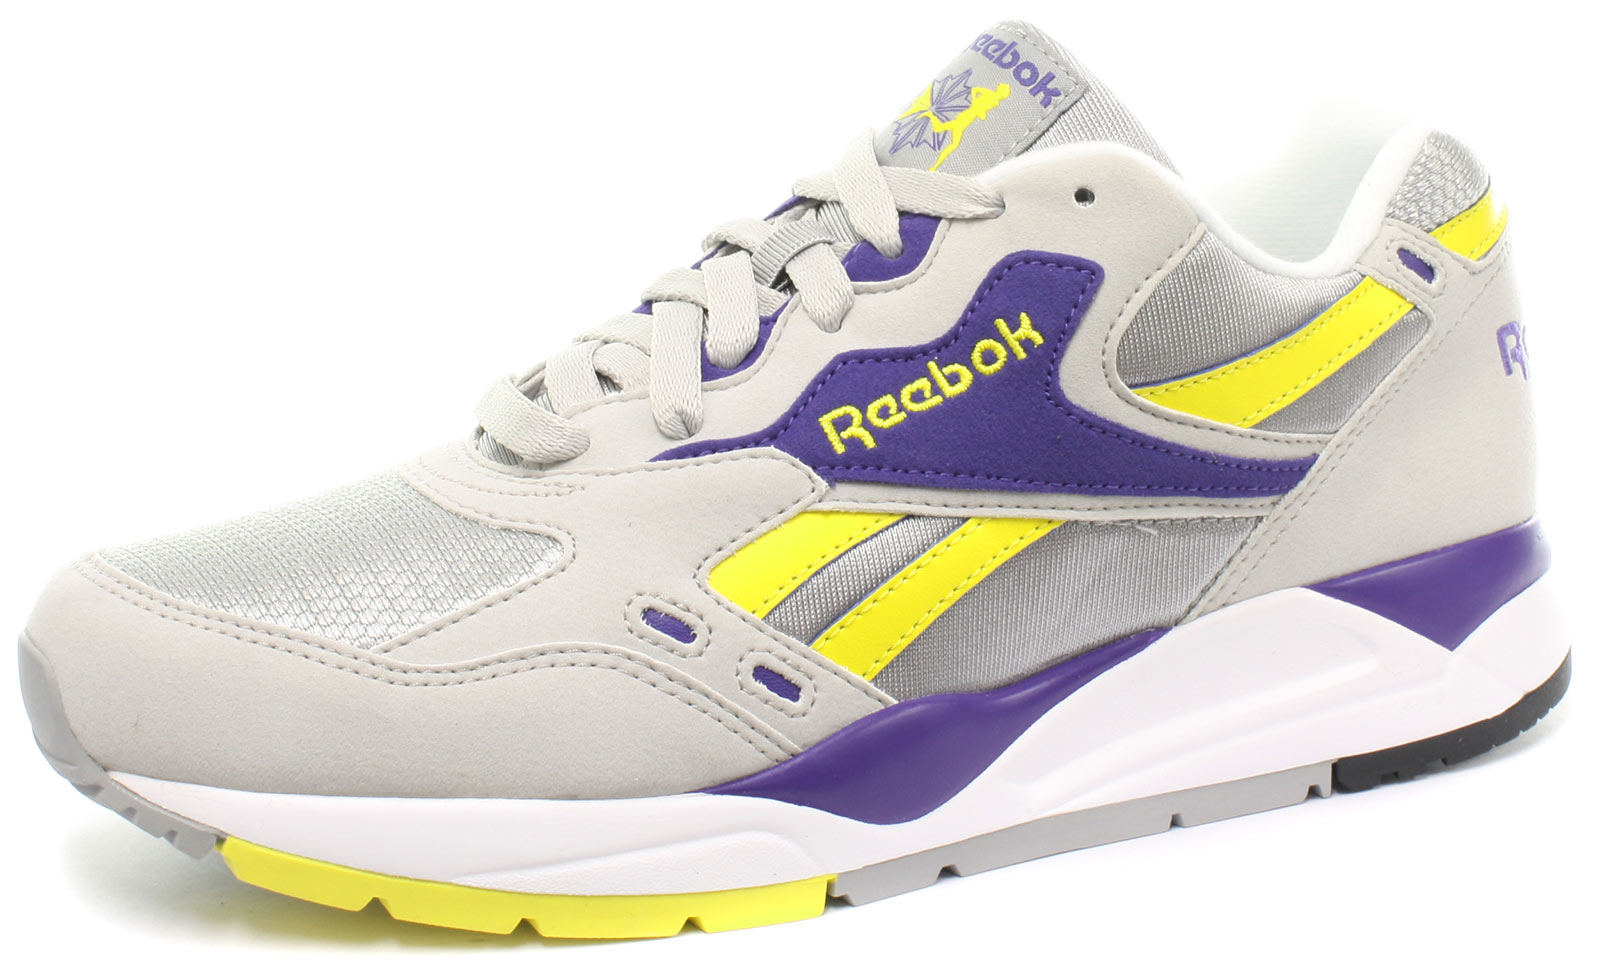 New-Reebok-Classic-Bolton-Mens-Retro-Trainers-ALL-SIZES